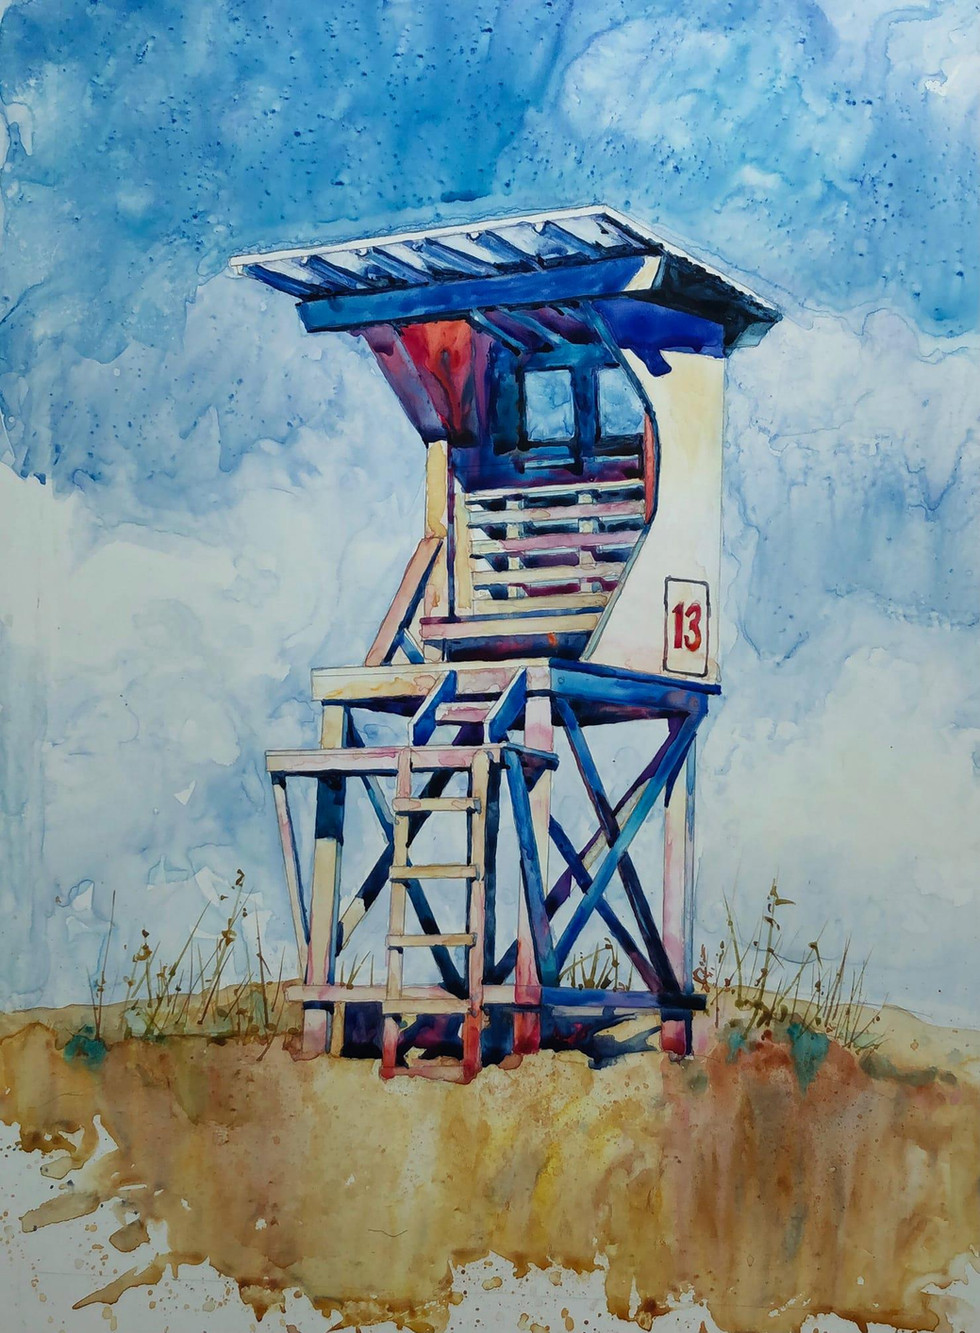 Lifeguard Stand #13